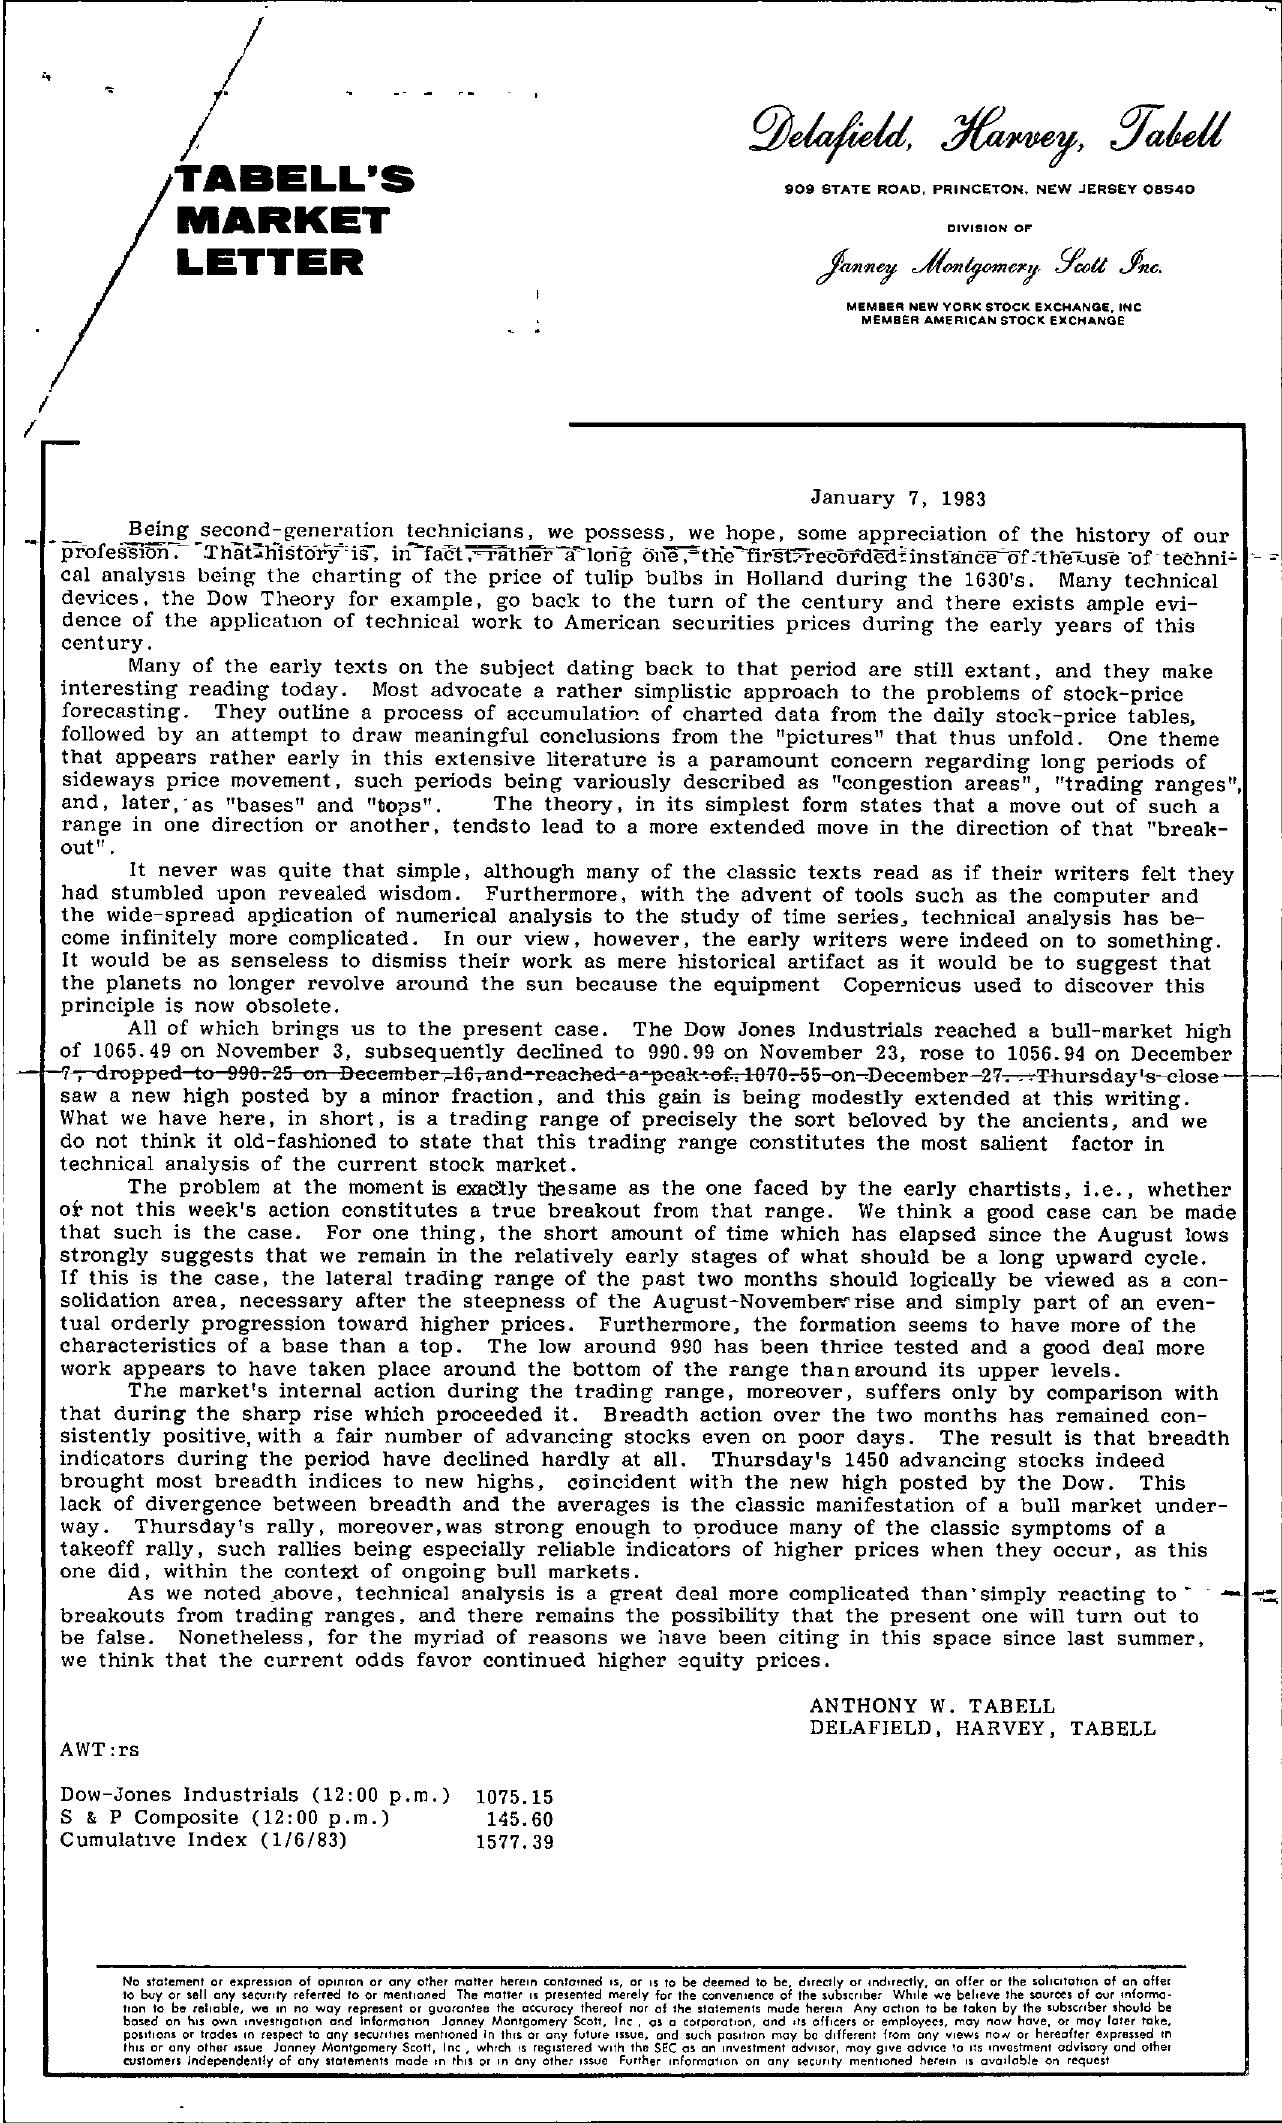 Tabell's Market Letter - January 07, 1983